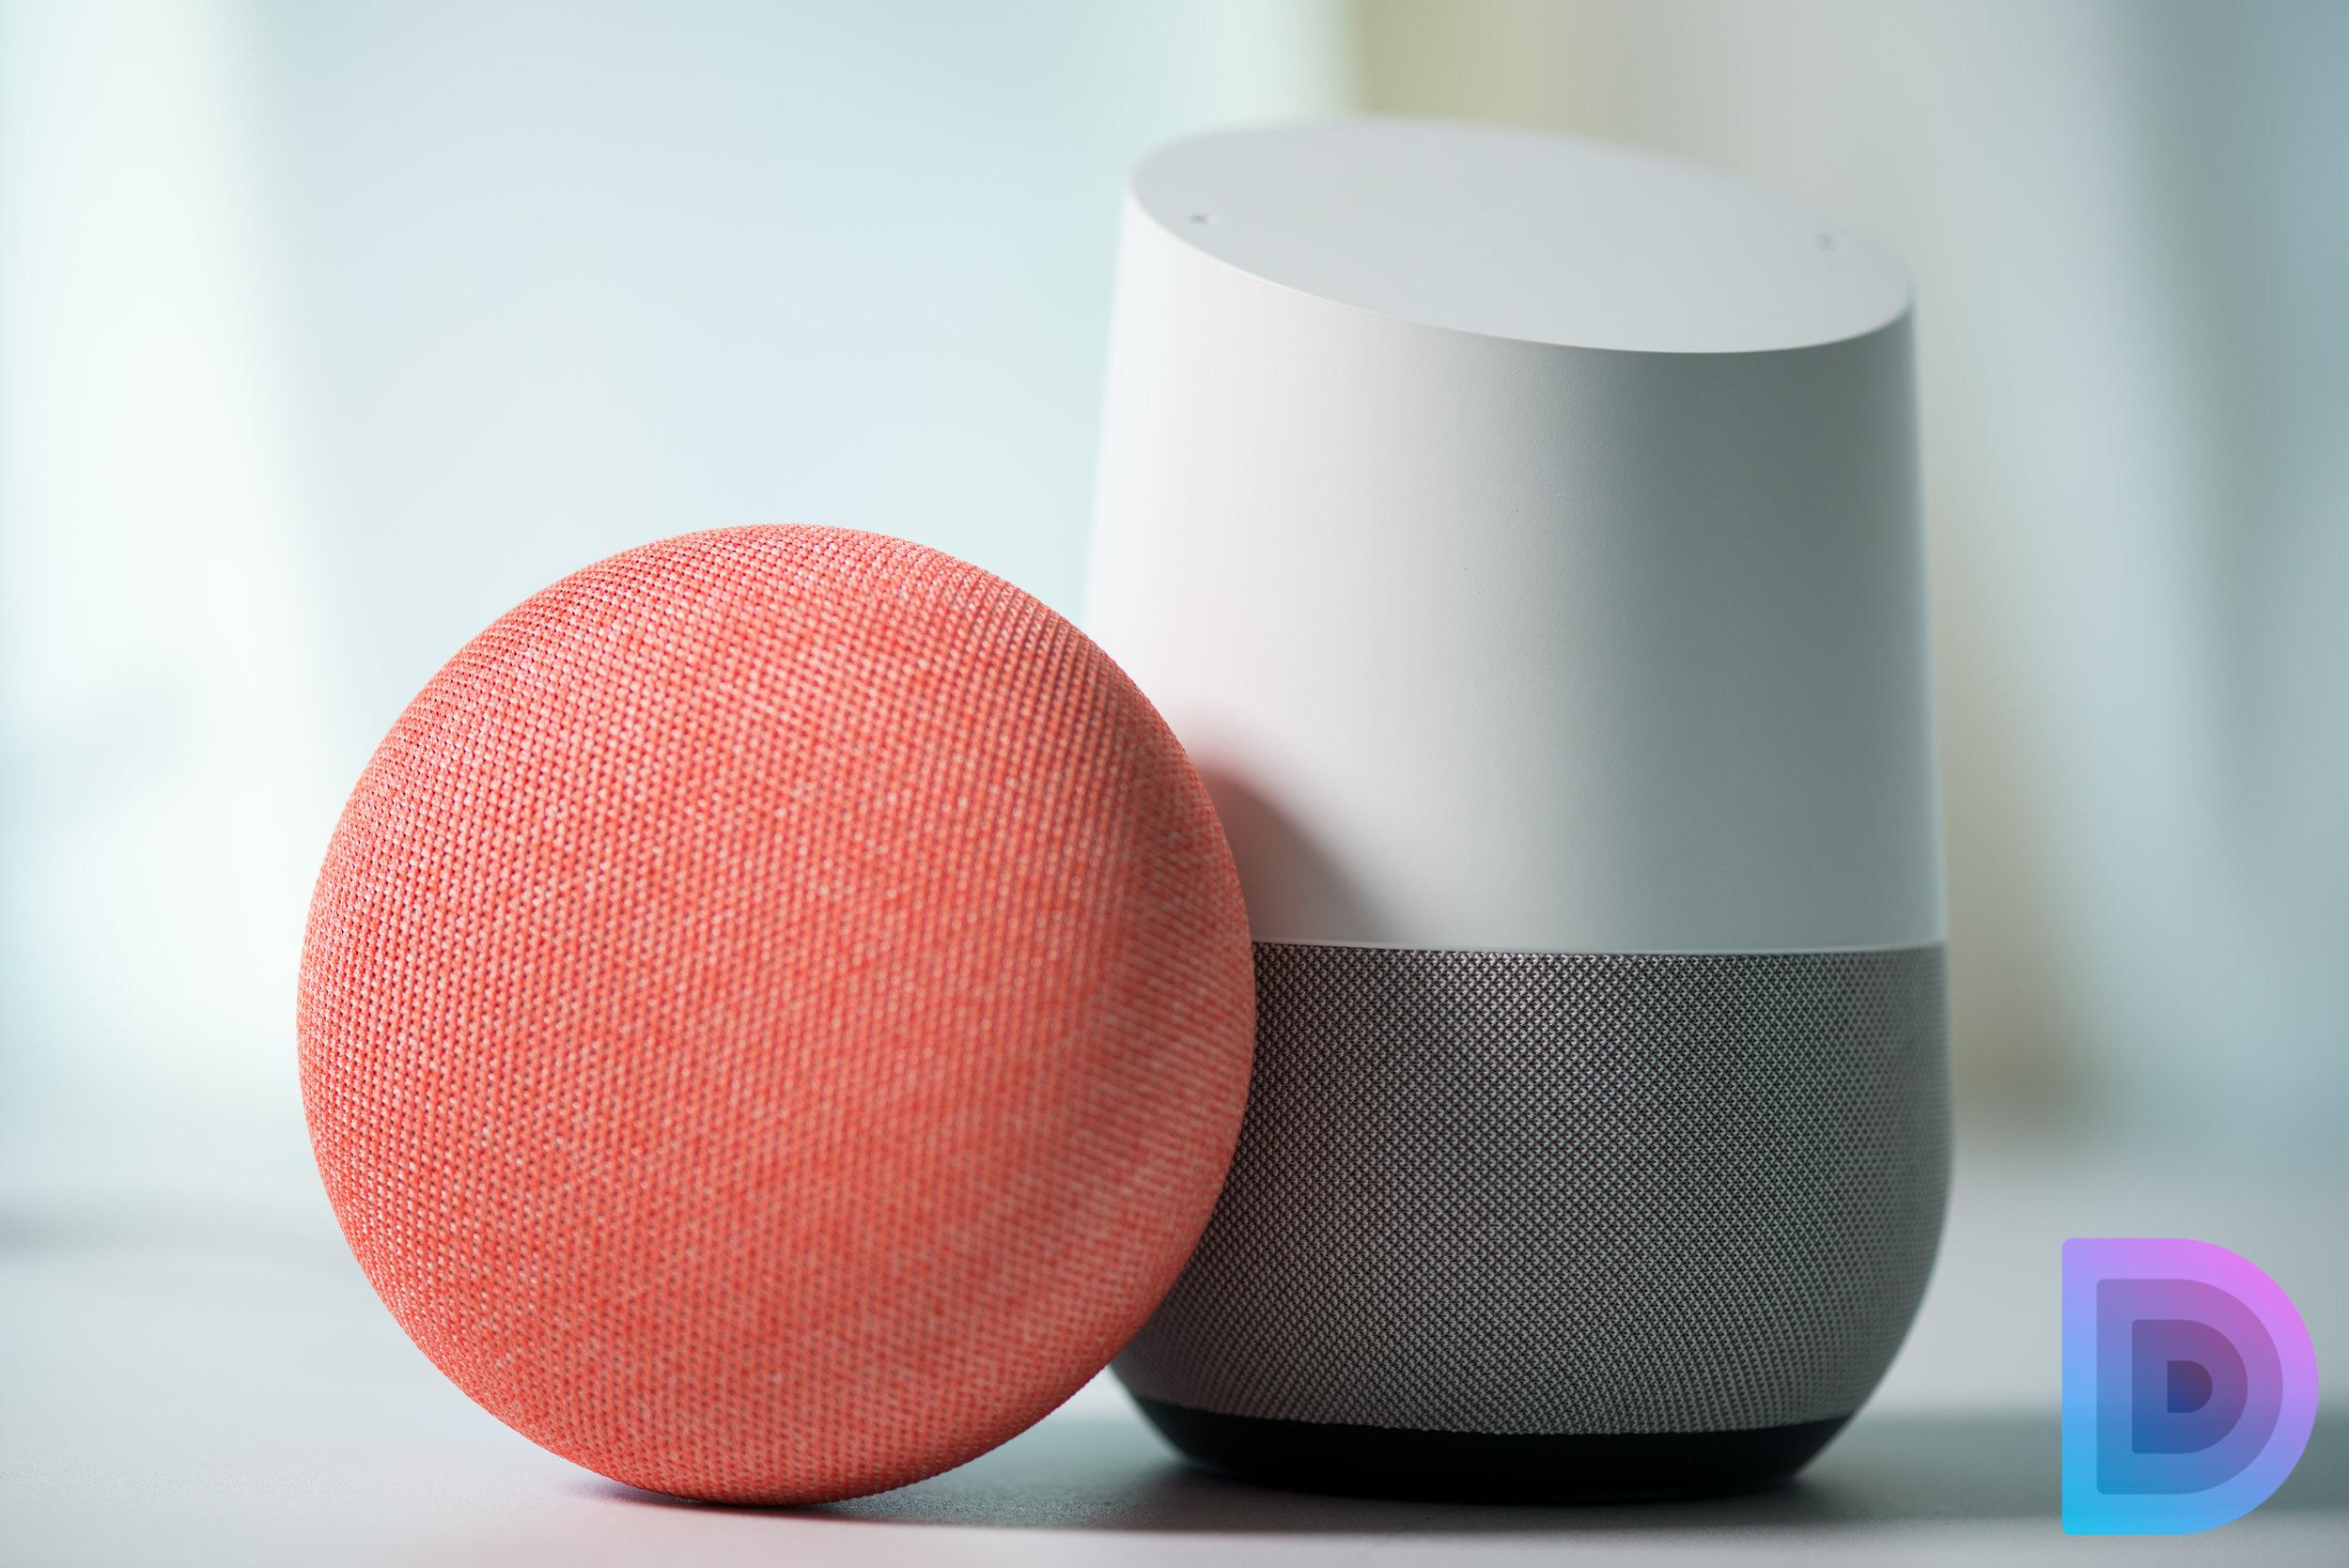 Google-Home-vs-Google-Home-Mini-1.JPG